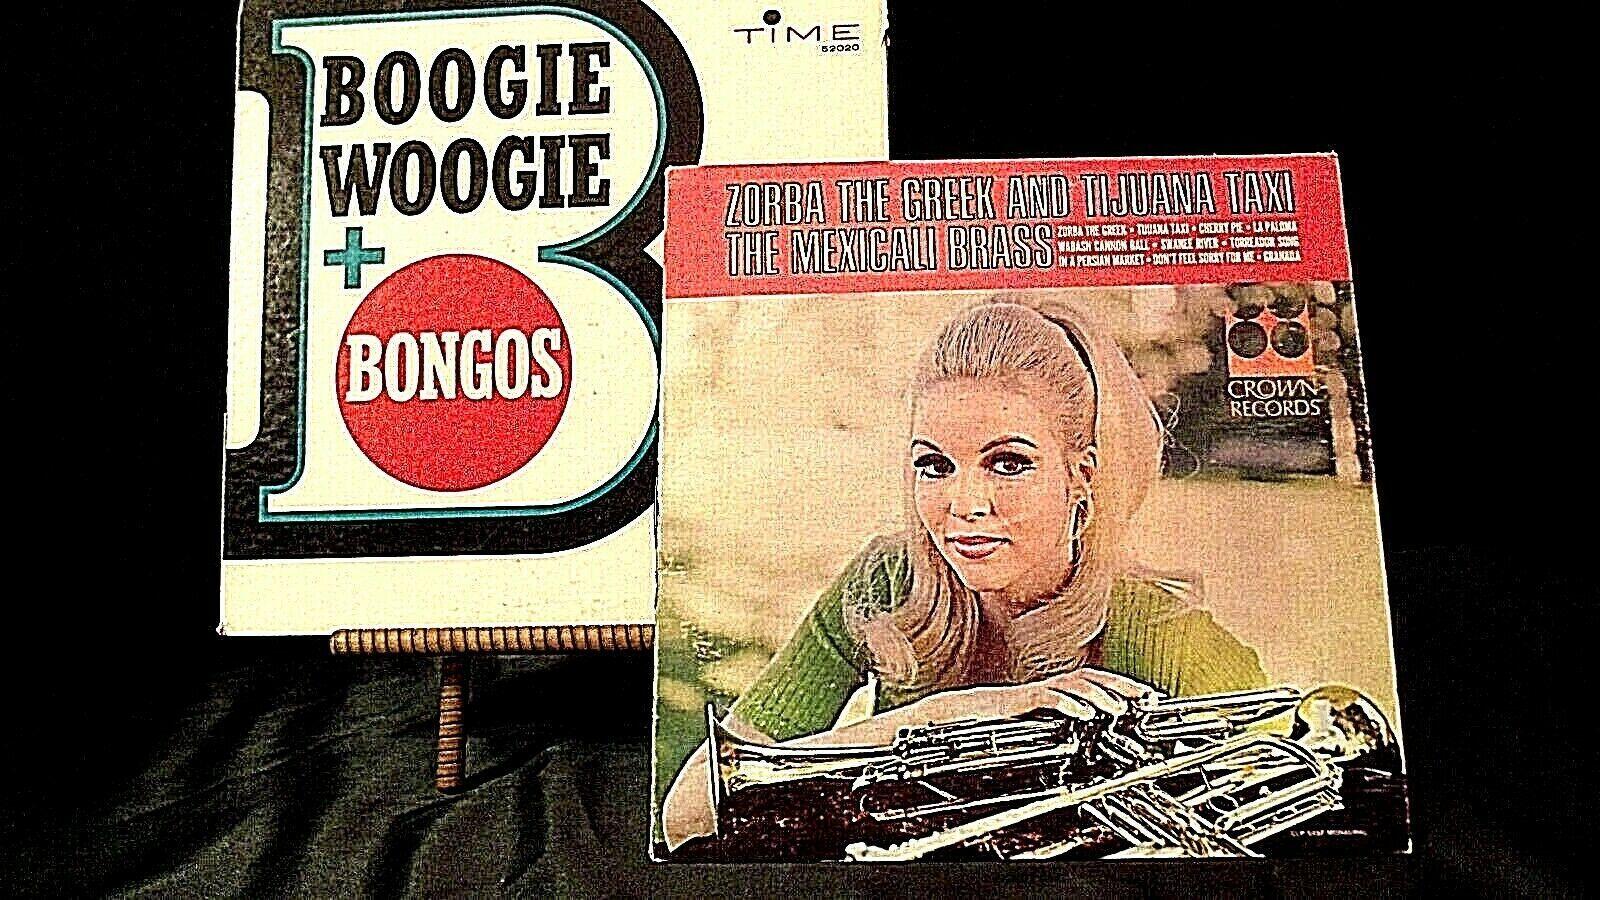 Zorba the Greek Tijuana Mexicali brass & Boogie Woogie  Bongos AA20-RC2134 Vinta